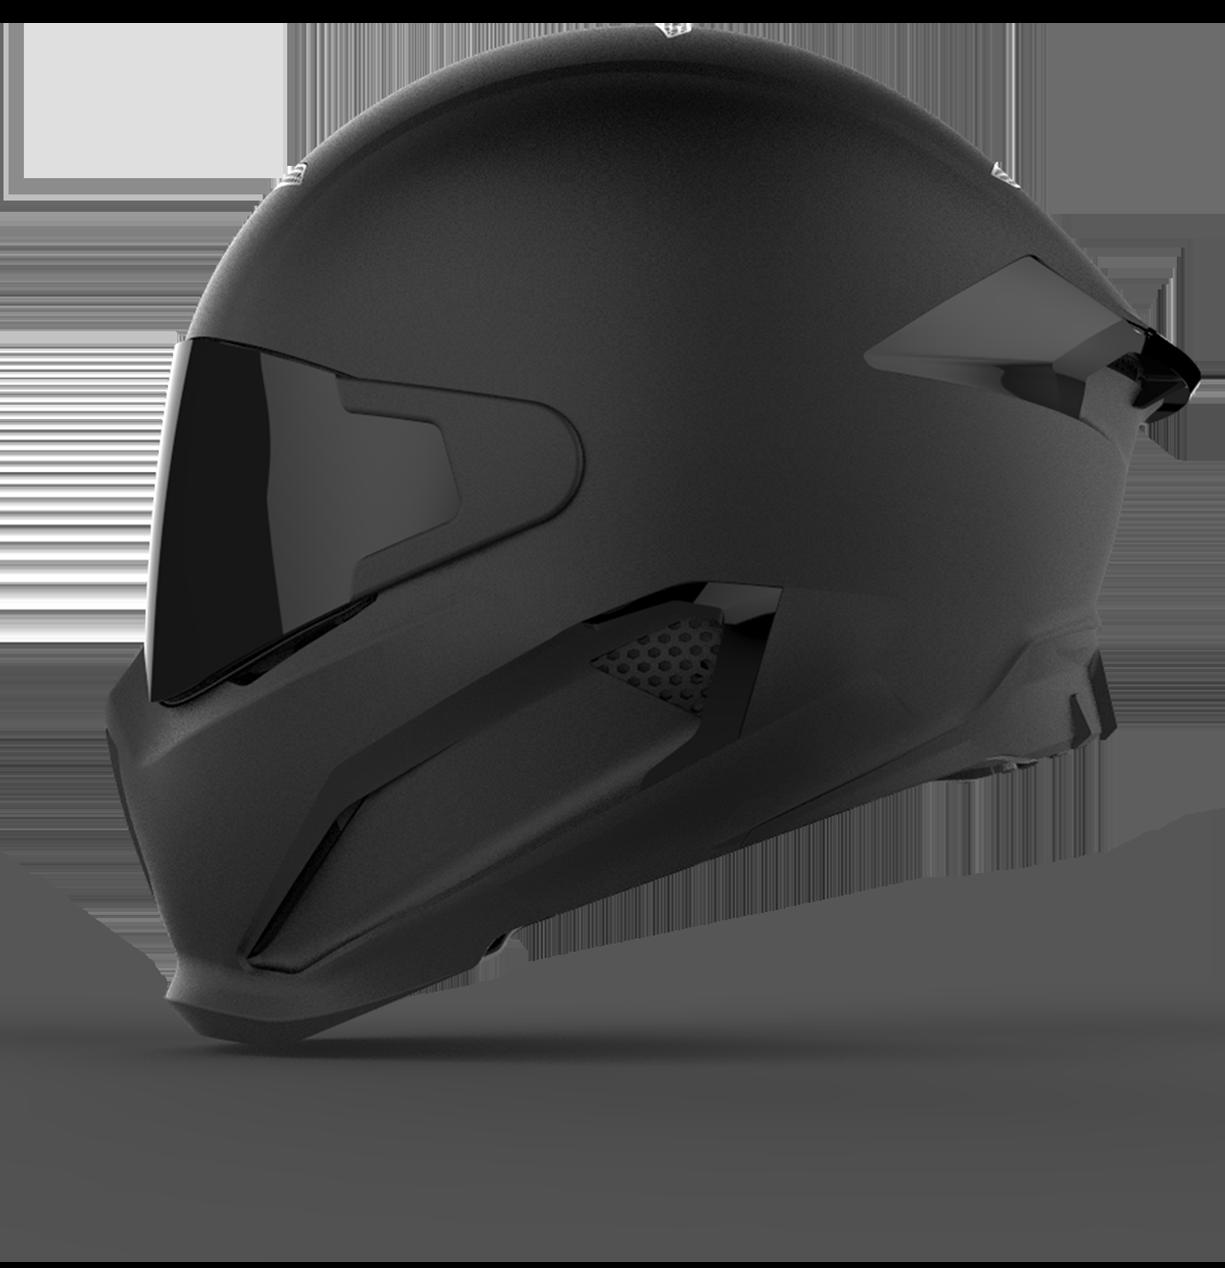 85126d81 Ruroc Atlas Helmet Street Version | Motorcycle Riding Gear ...